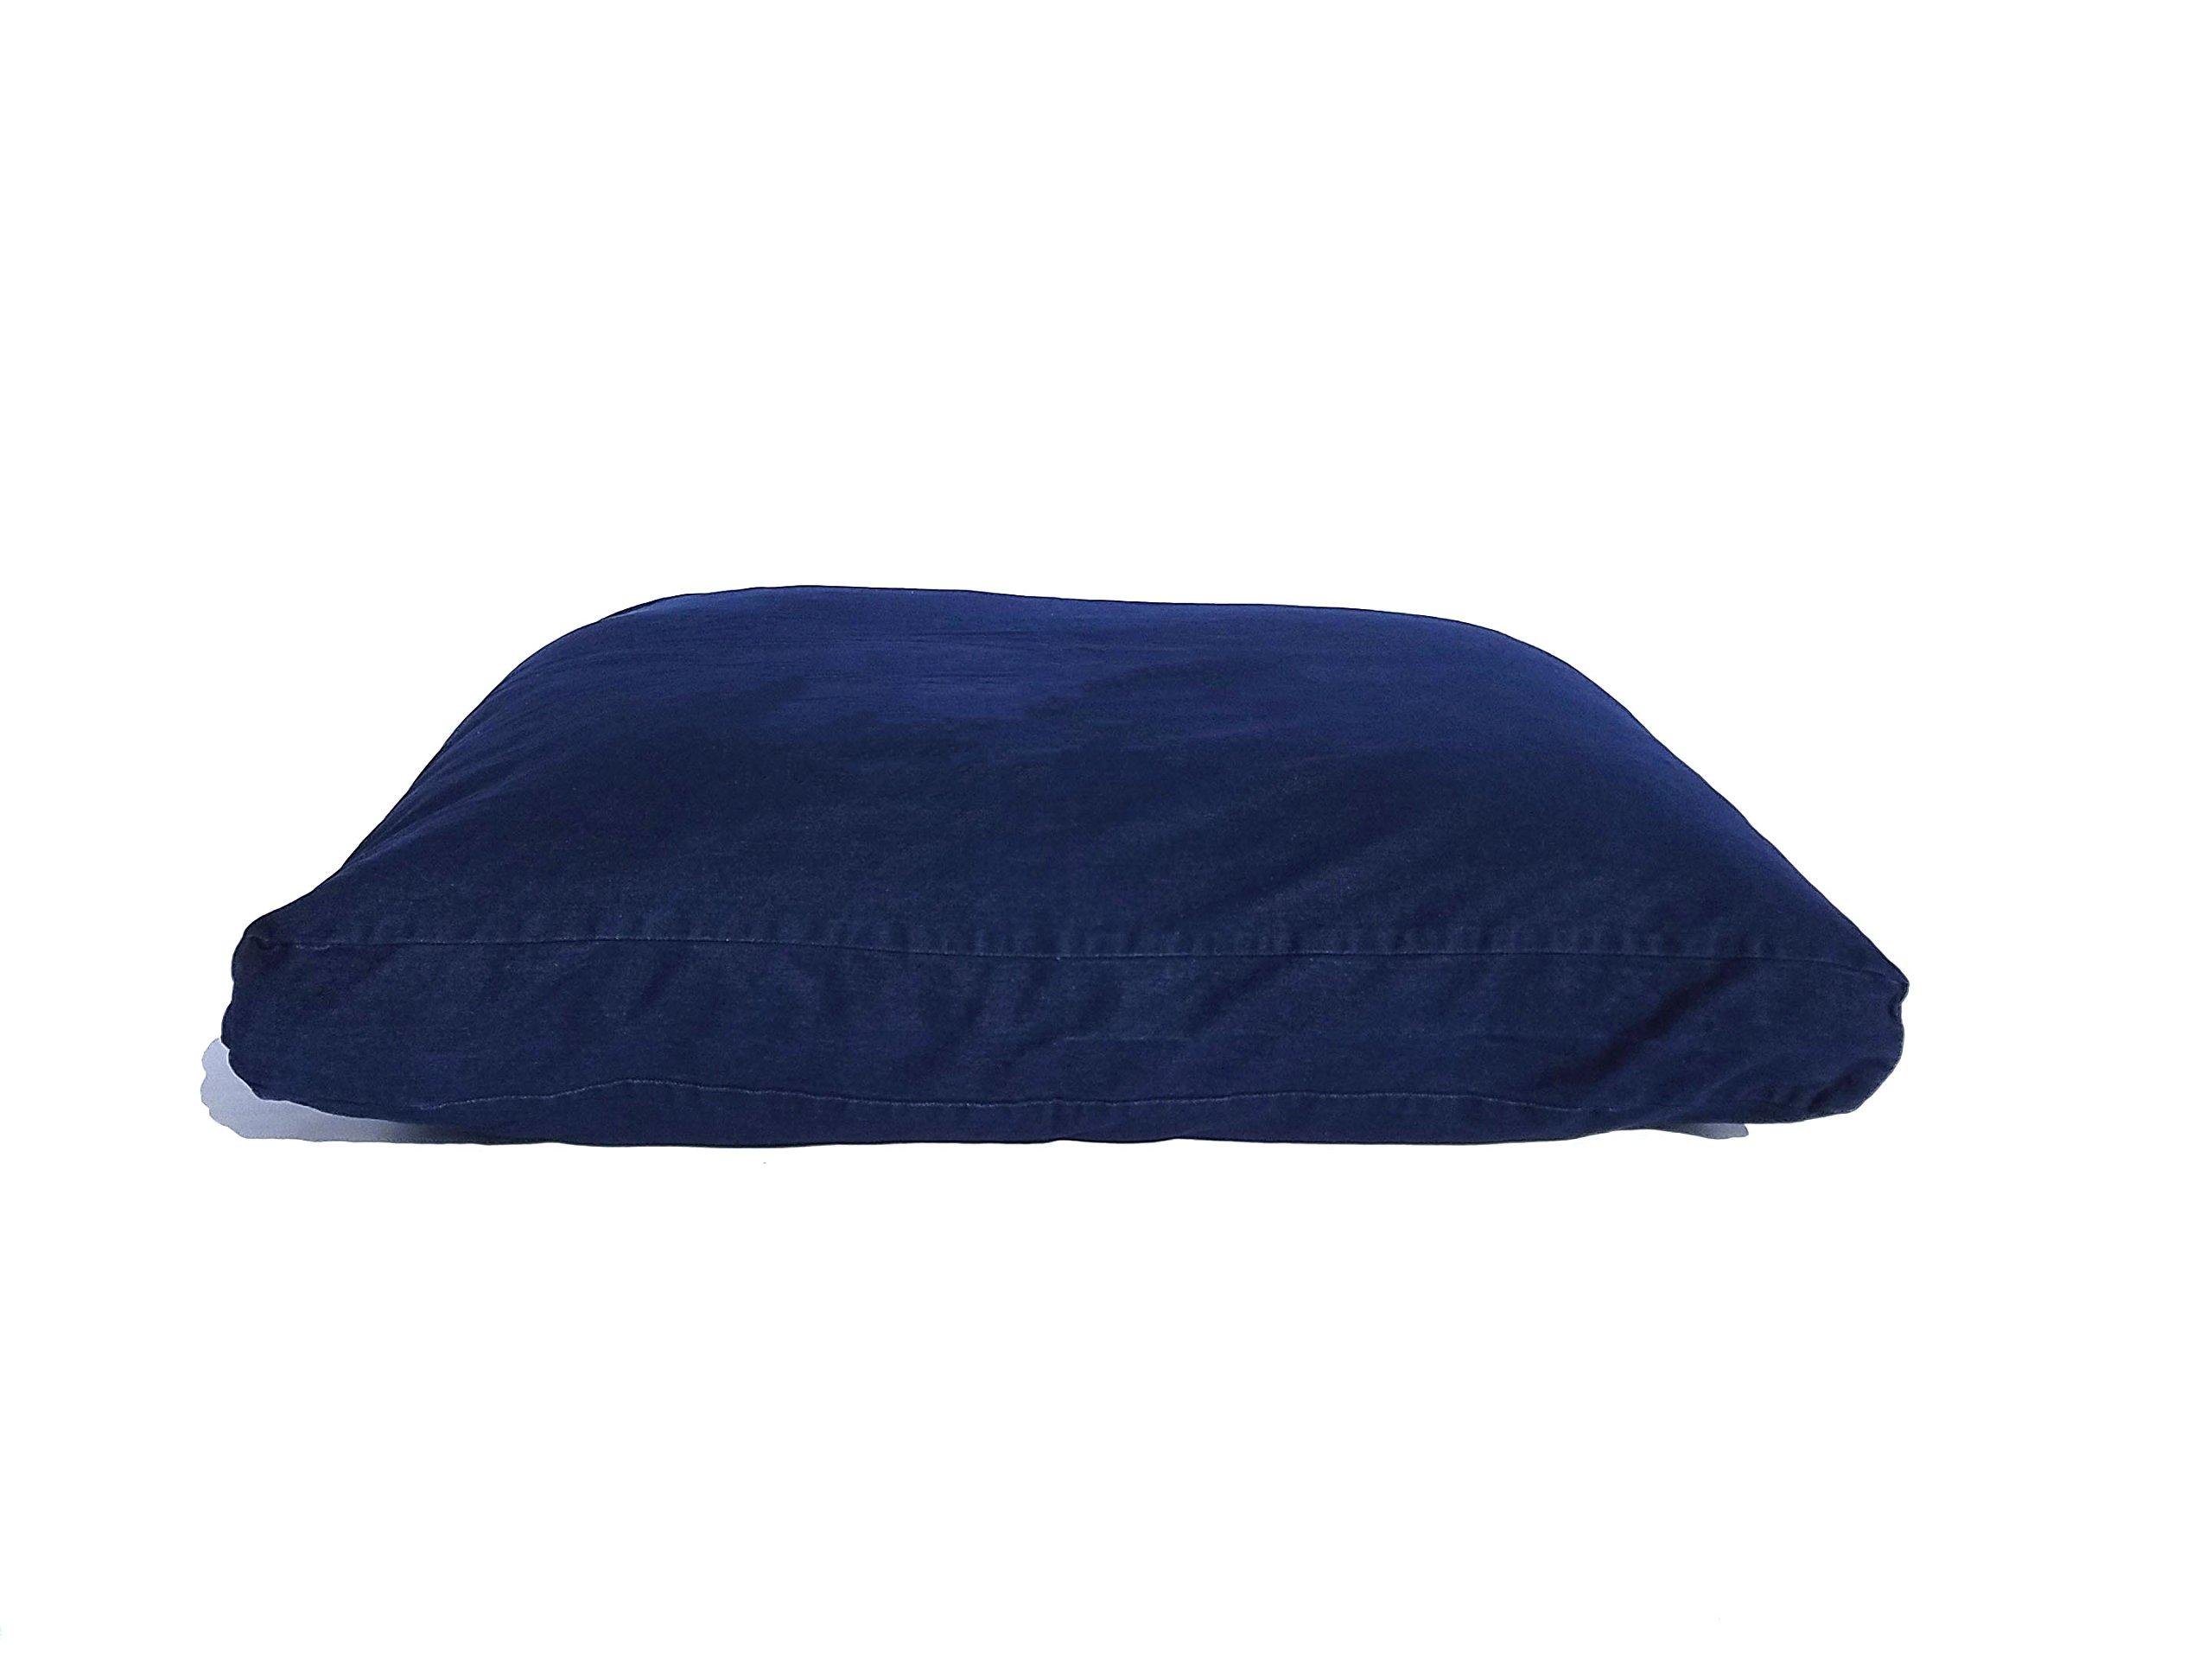 YAWP Memory Foam Pet Bed Pillow with Waterproof Internal Cover and Heavy Duty Denim Cover + Bonus Vacuum Storage Bag (55X37X4, Blue Jean Denim)